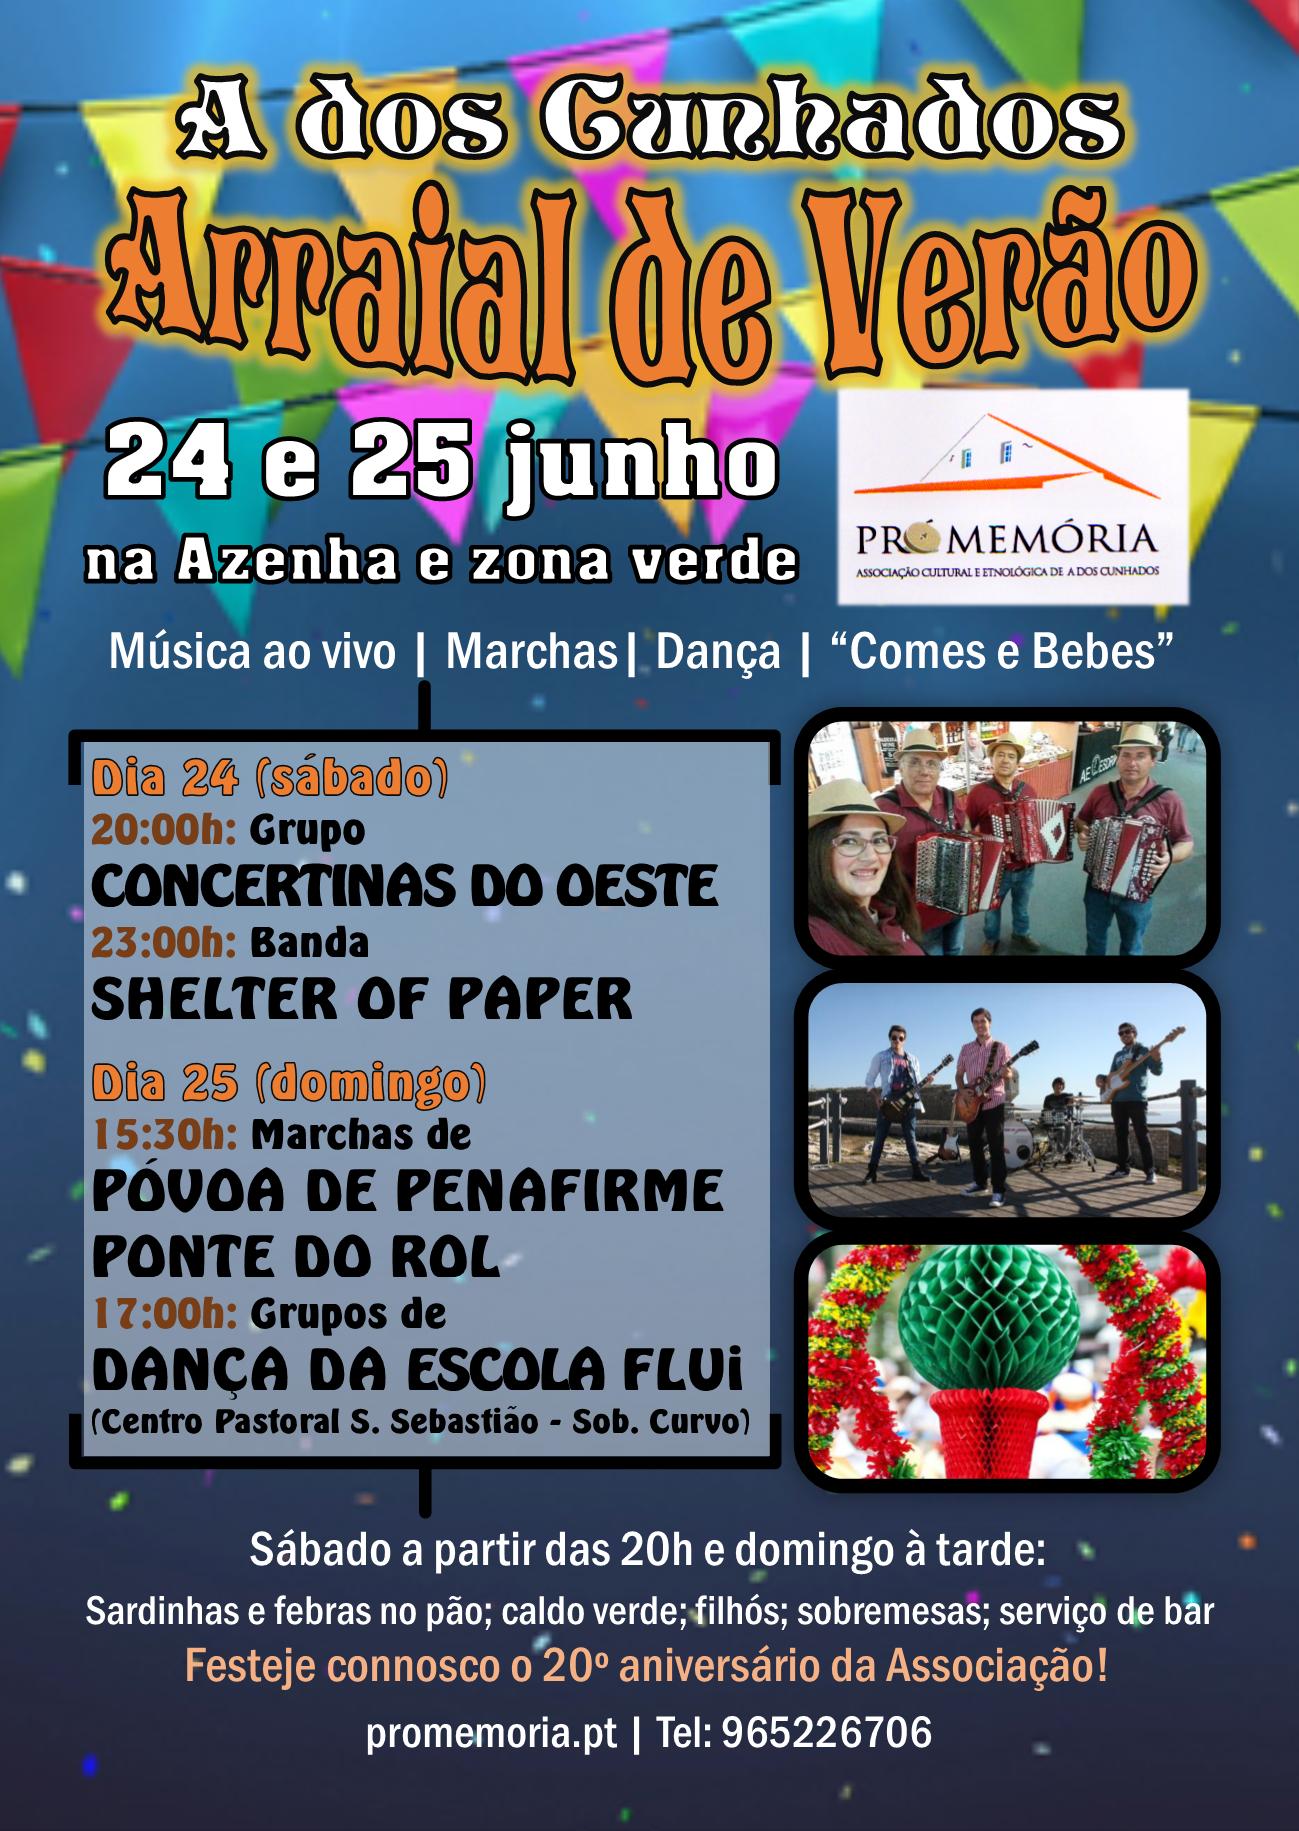 cartazArraial1